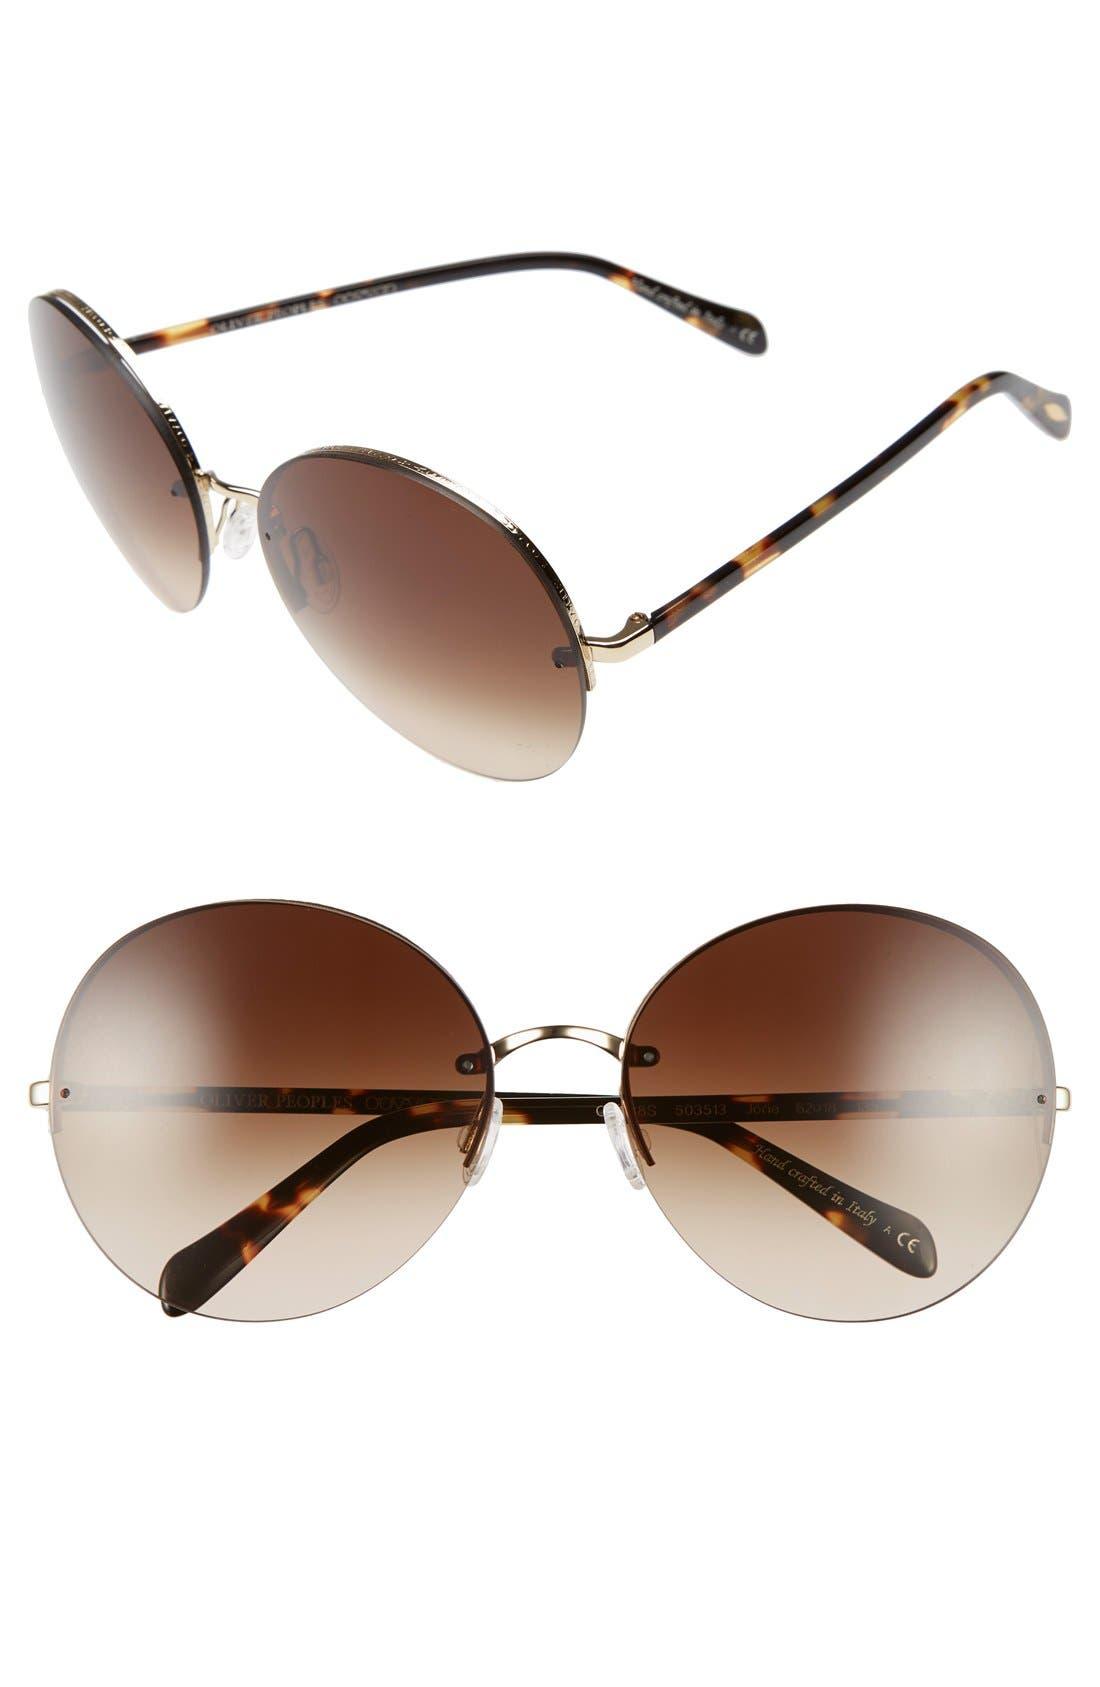 oliver peoples sunglasses for women | nordstrom